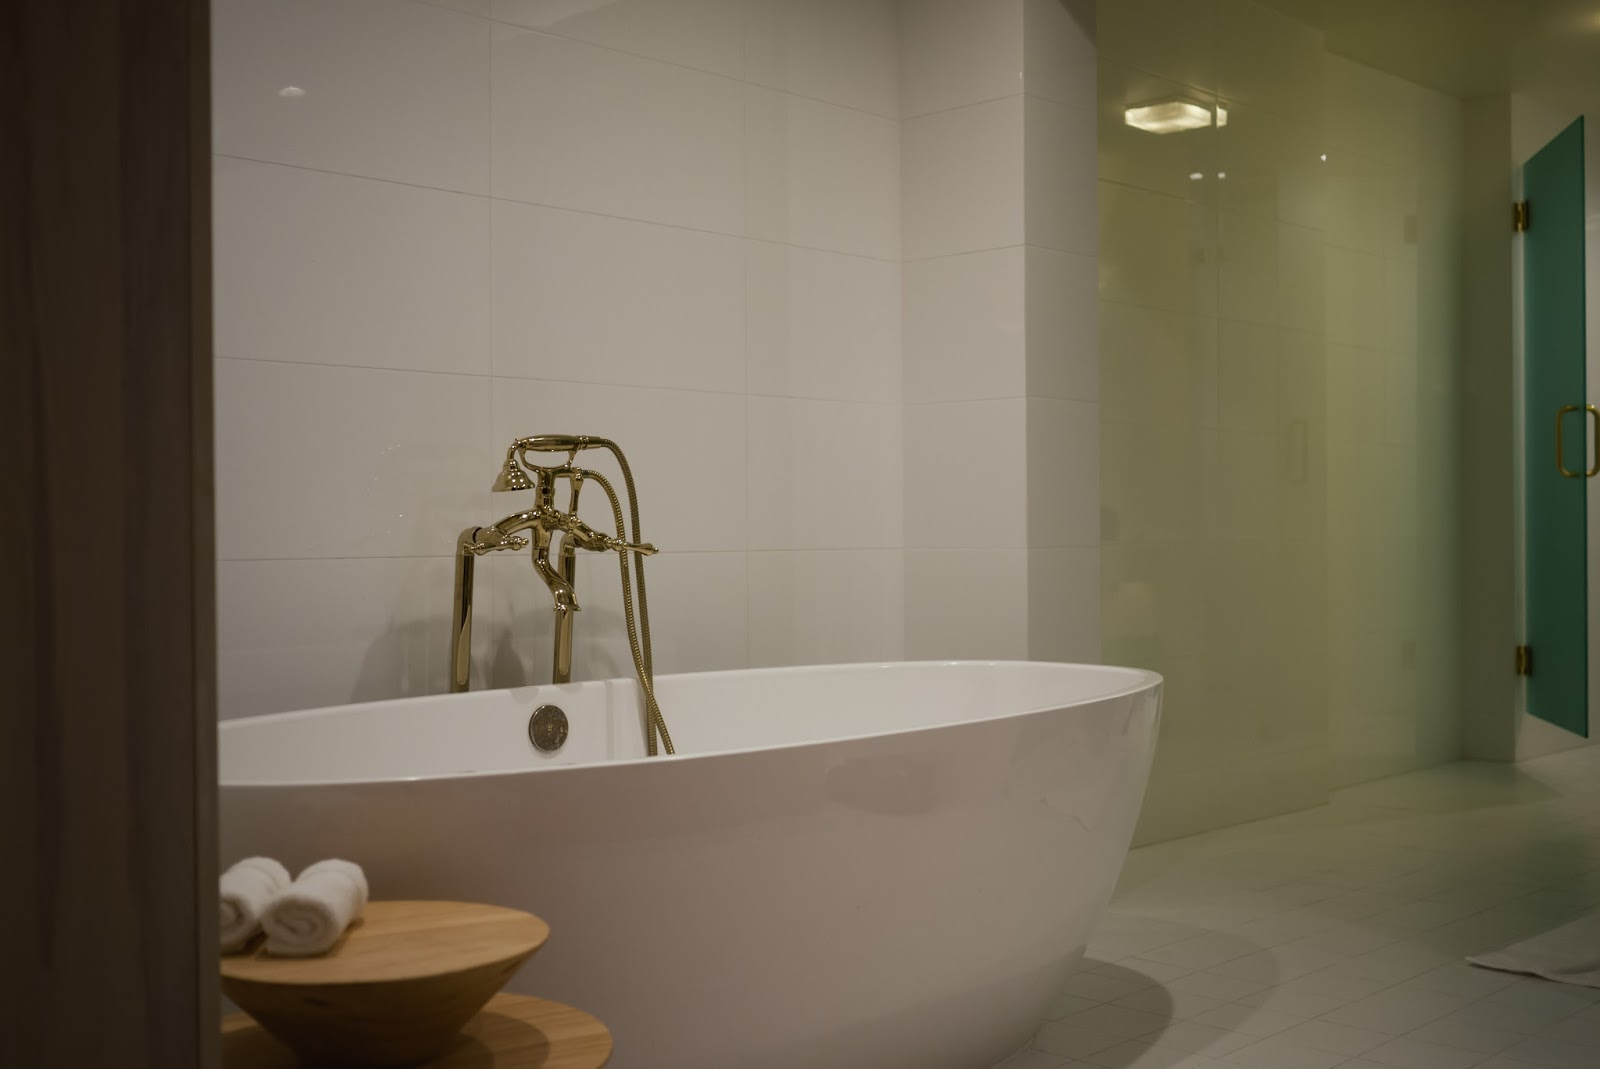 mybelonging-thelinehotel-losangeles-koreatown-hoteltonight-htinsider-30.jpg